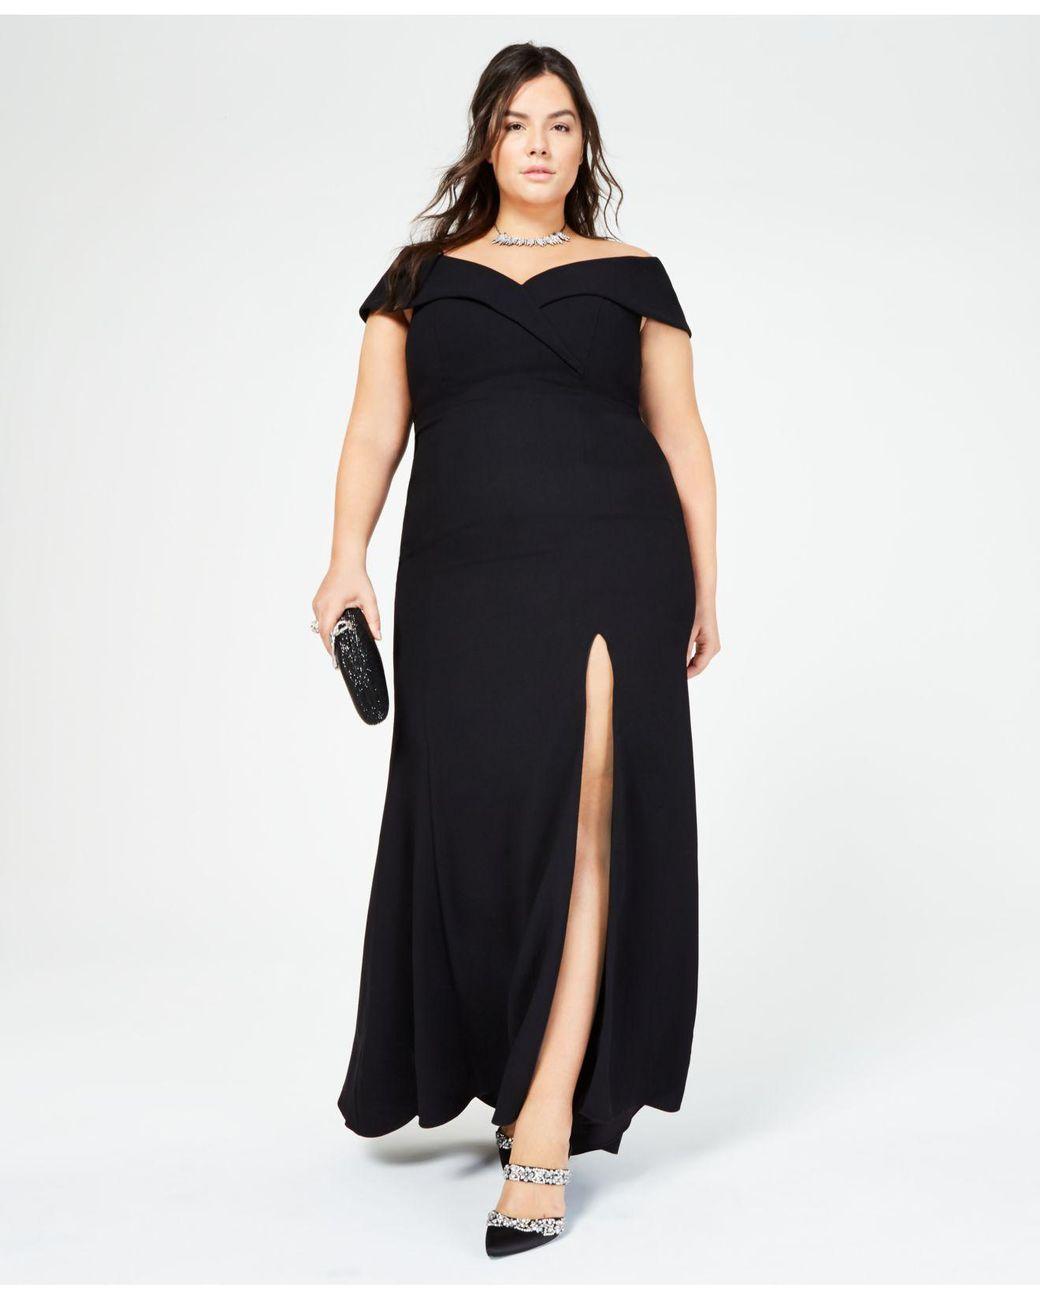 34fd2da7650 Xscape Plus Size Off-the-shoulder Slit Gown in Black - Lyst